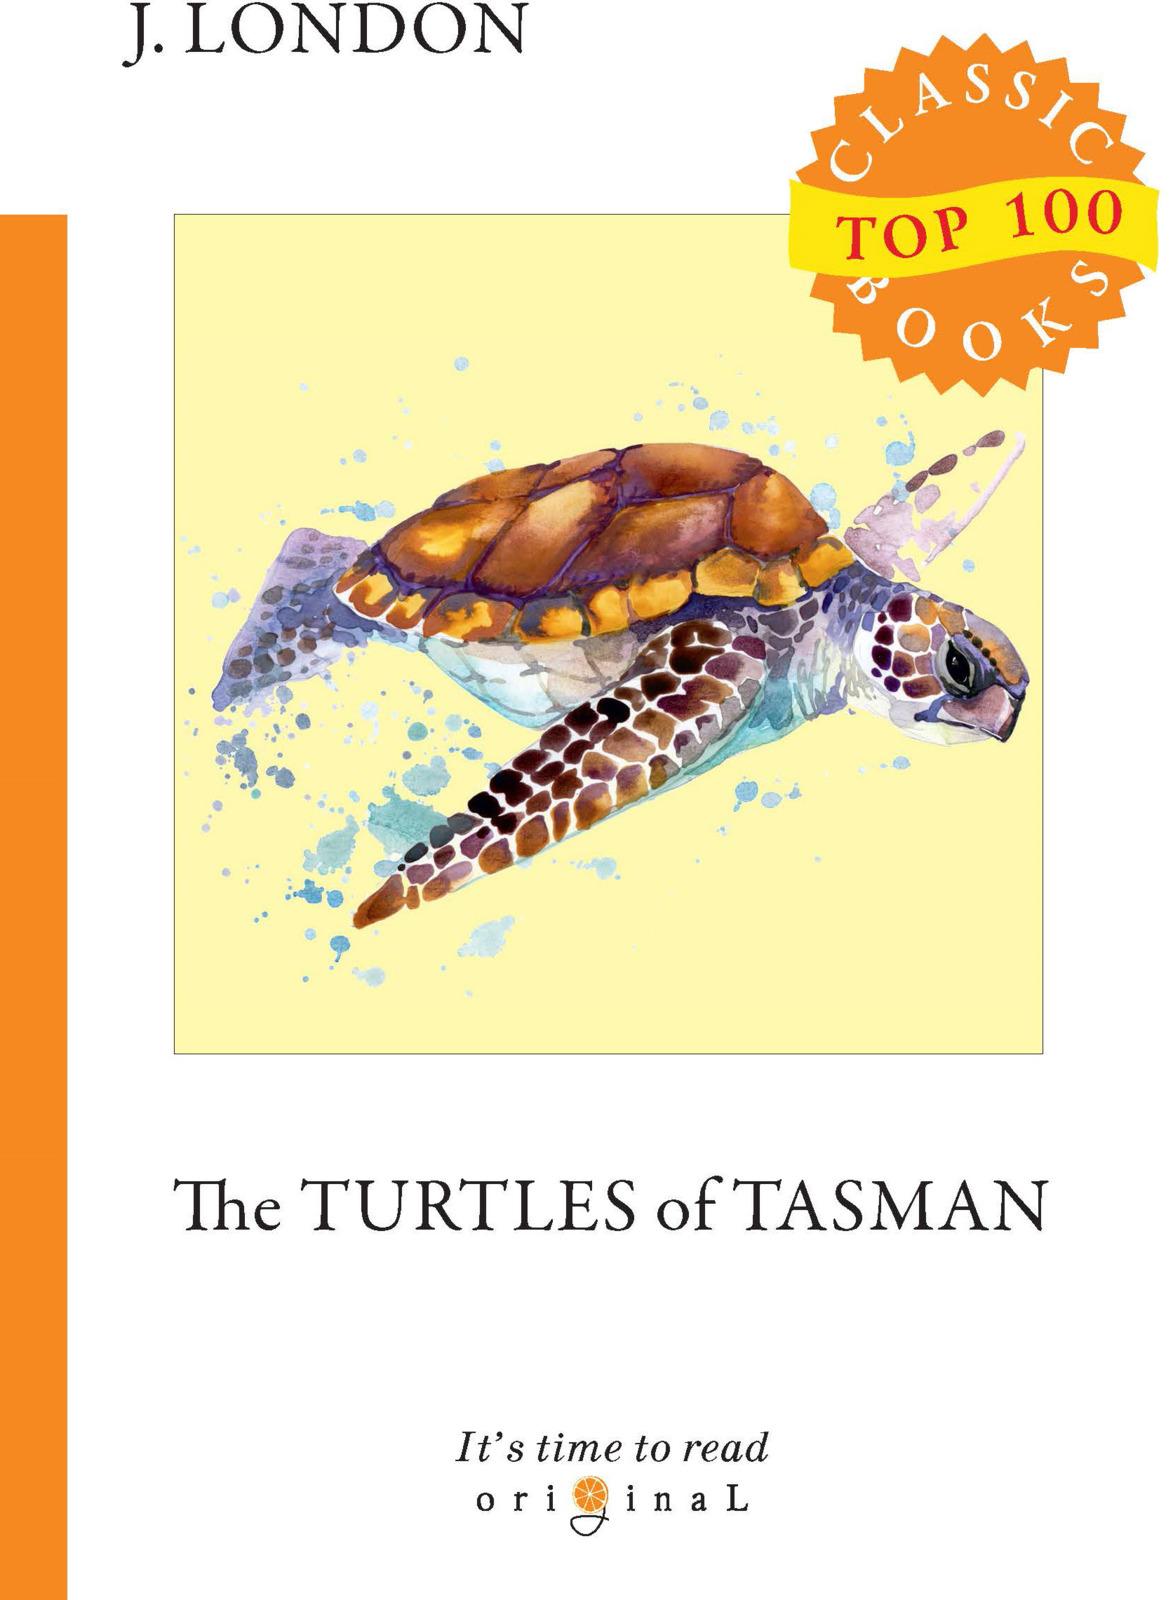 J. London The Turtles of Tasman london j the strength of the strong and the turtles of tasman сила сильных и черепахи тасмана т 25 на ан